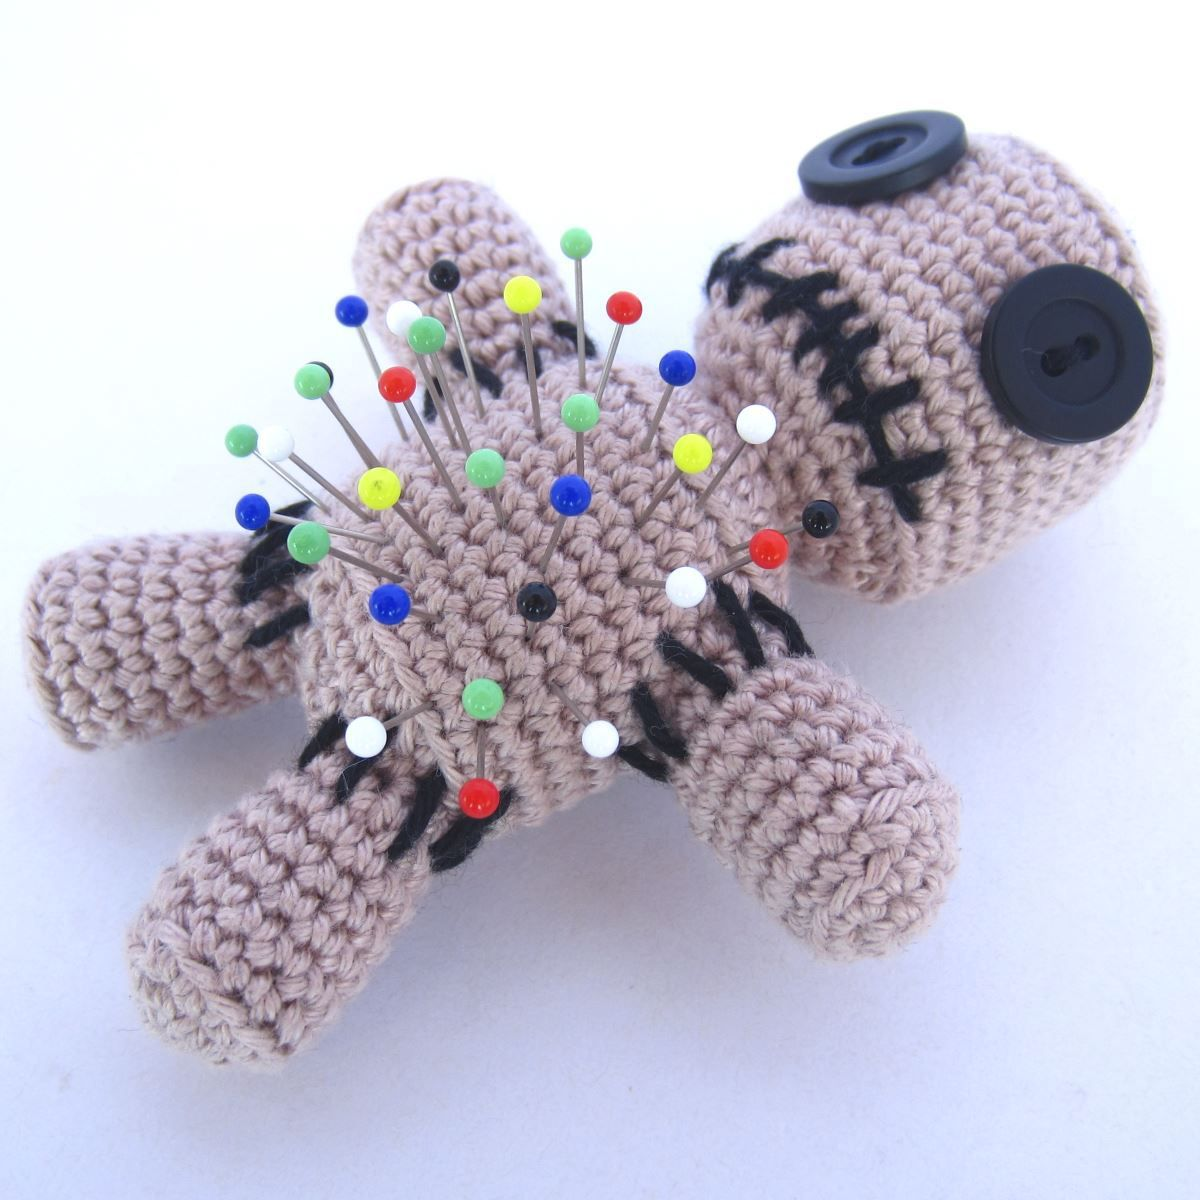 Amigurumi Voodoo Doll Pincushion - free crochet pattern from ...